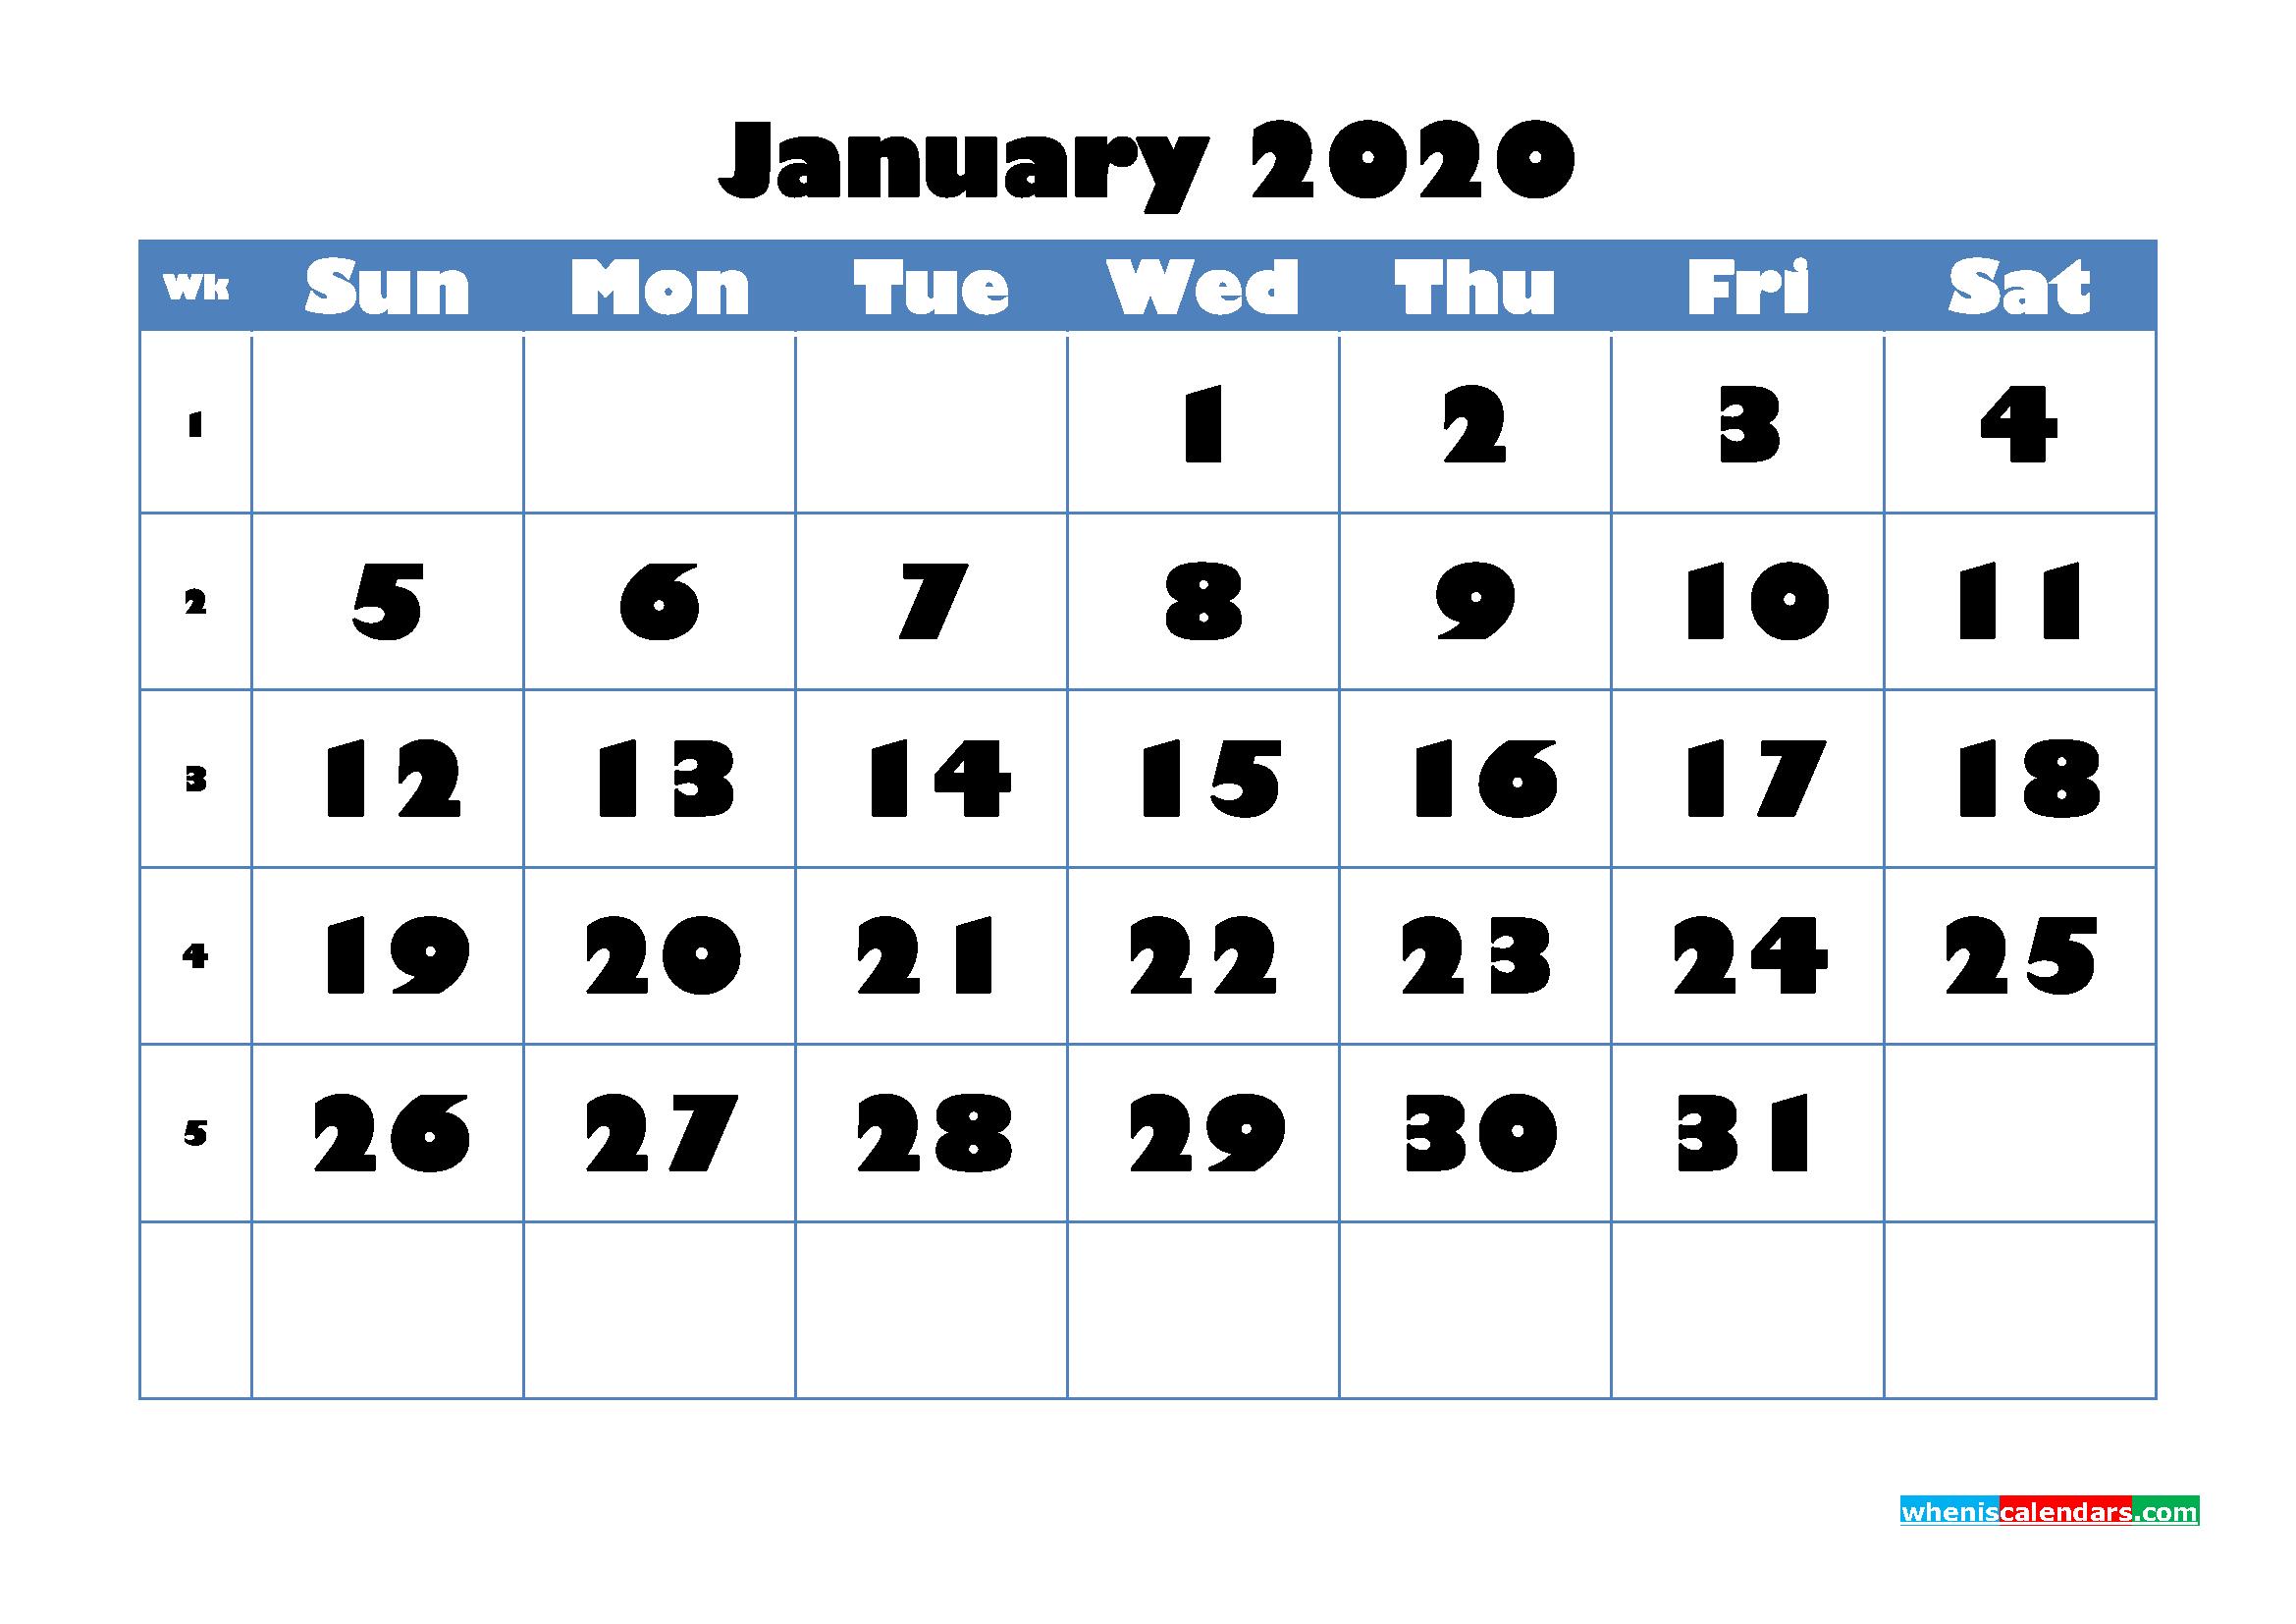 January 2020 Blank Calendar Printable - No.m20b709